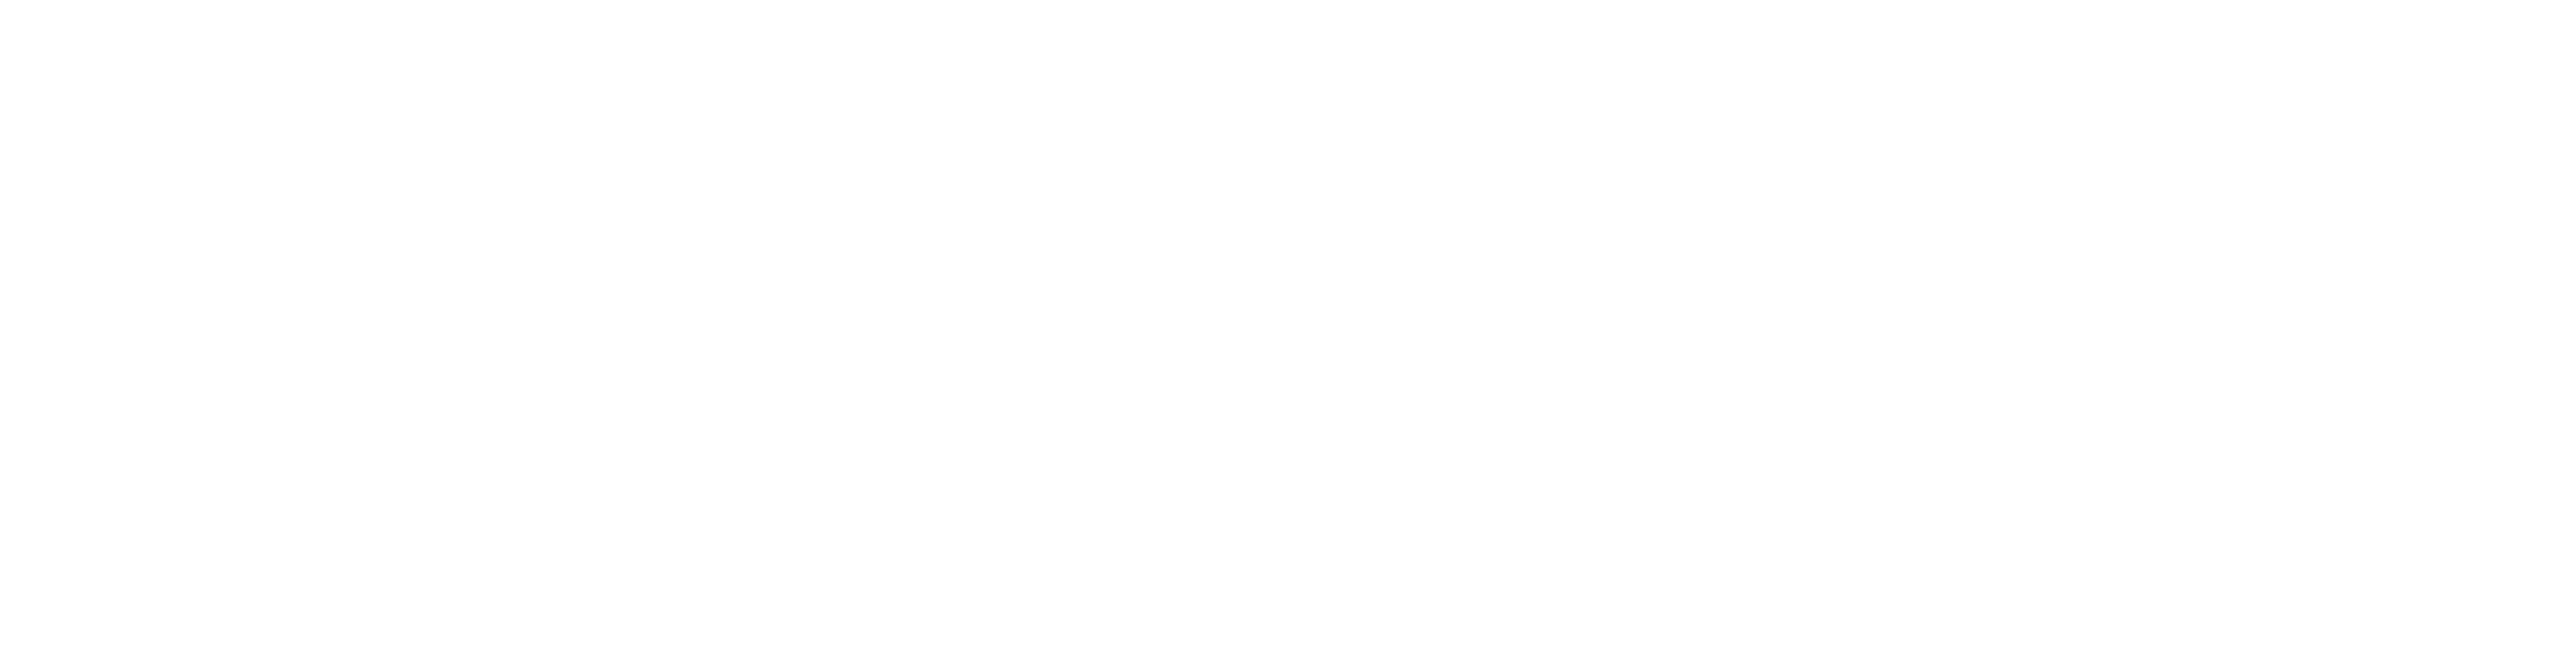 Blum-logo-2019